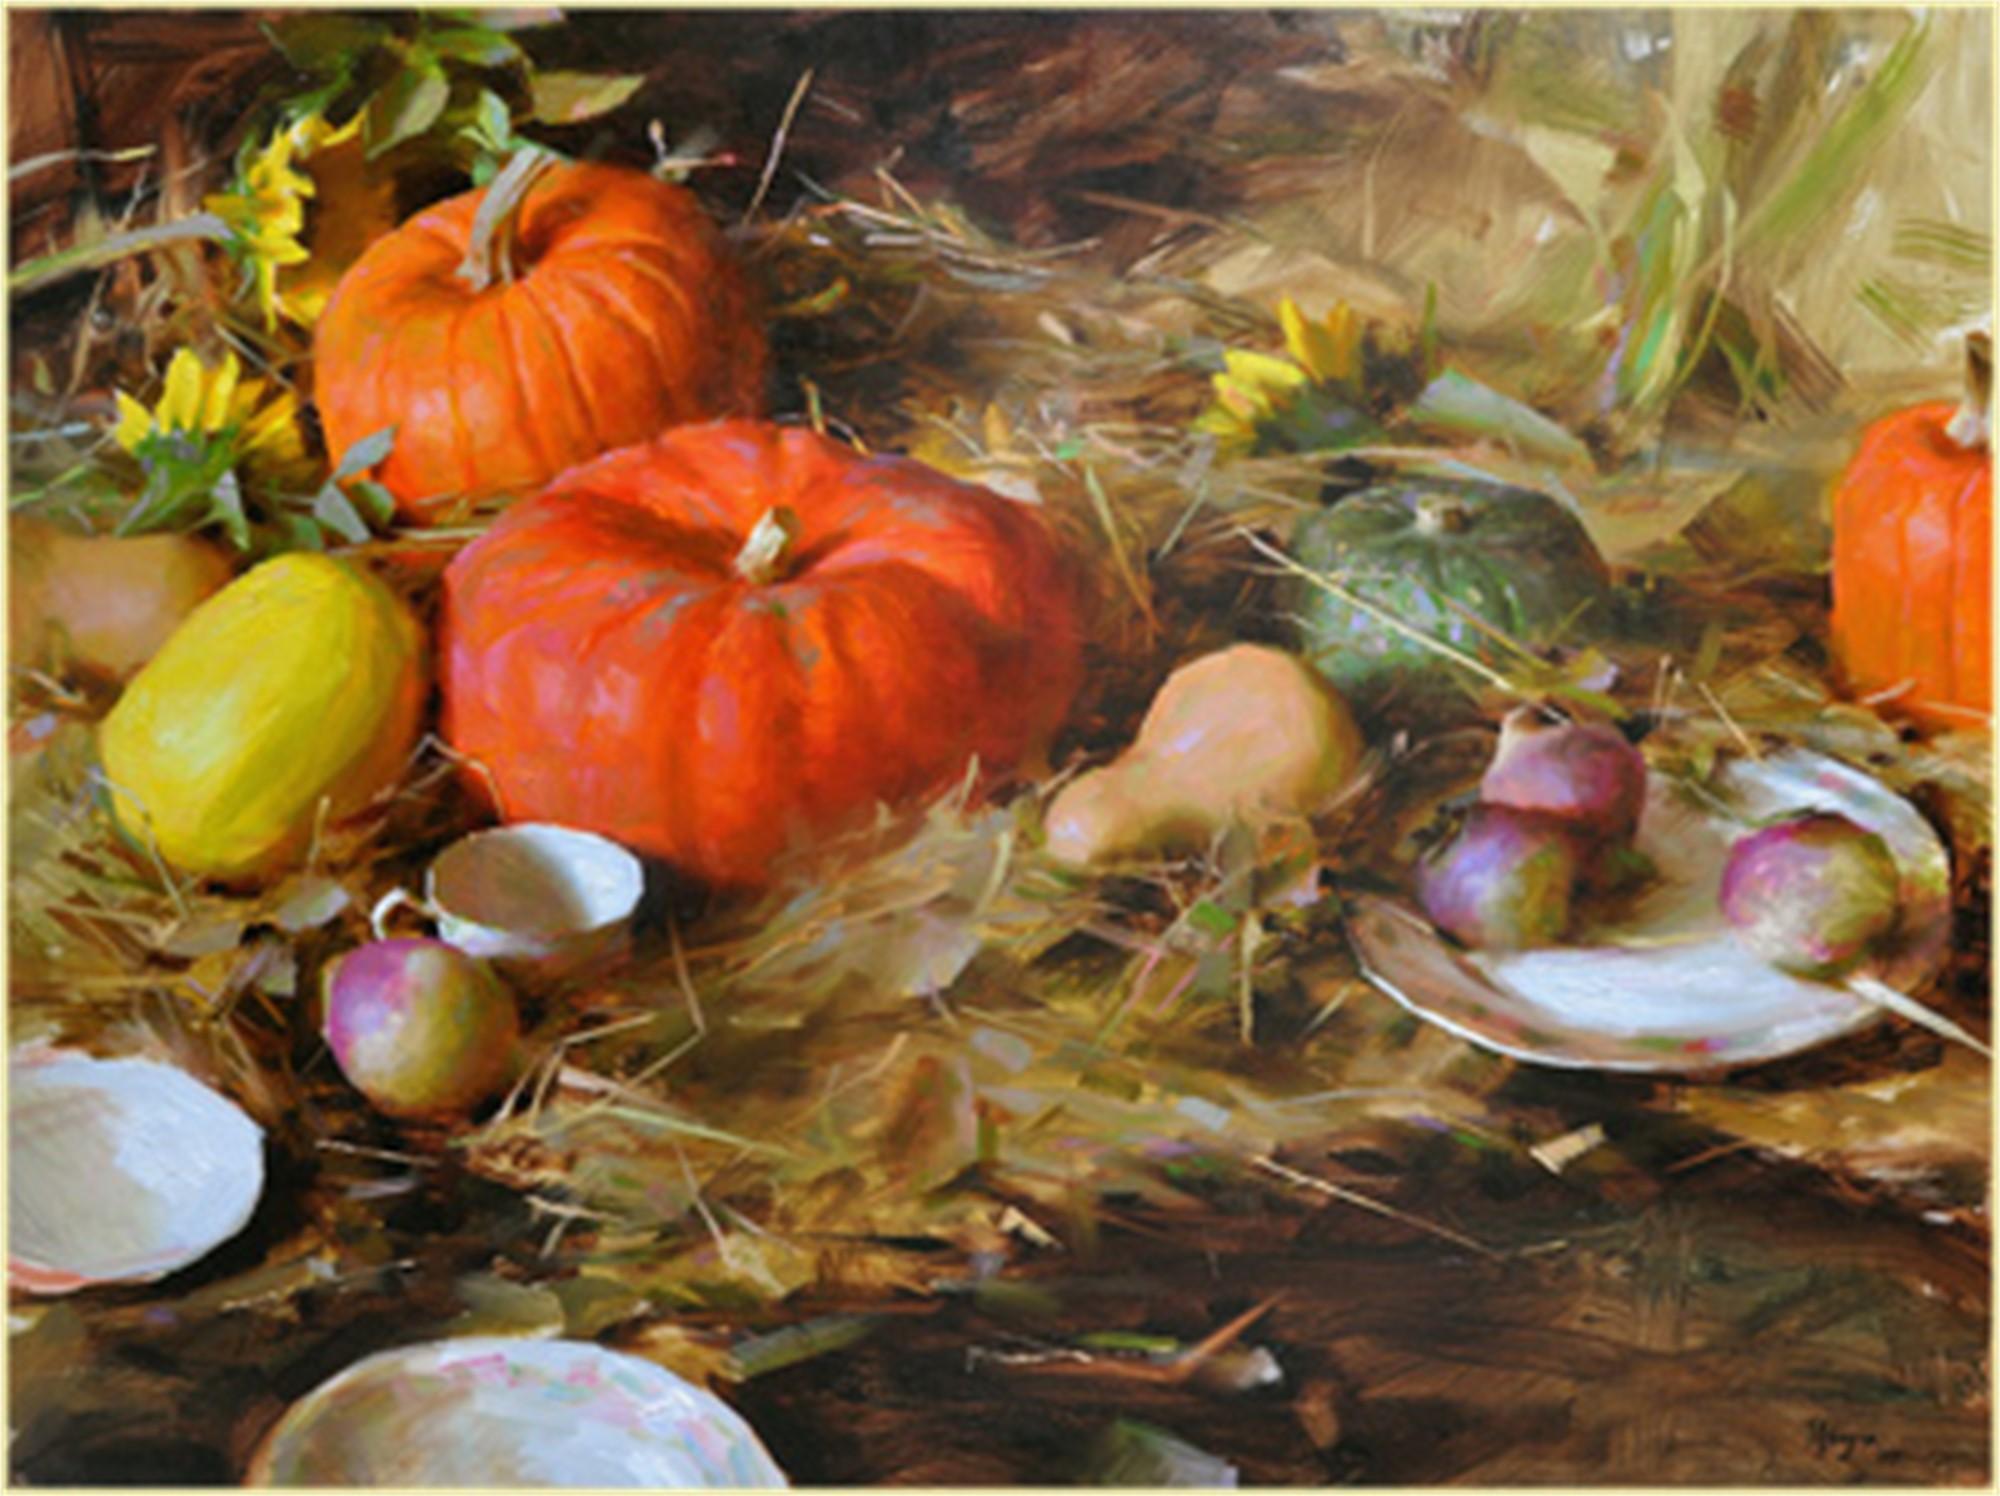 Autumn Still Life by Daniel Keys